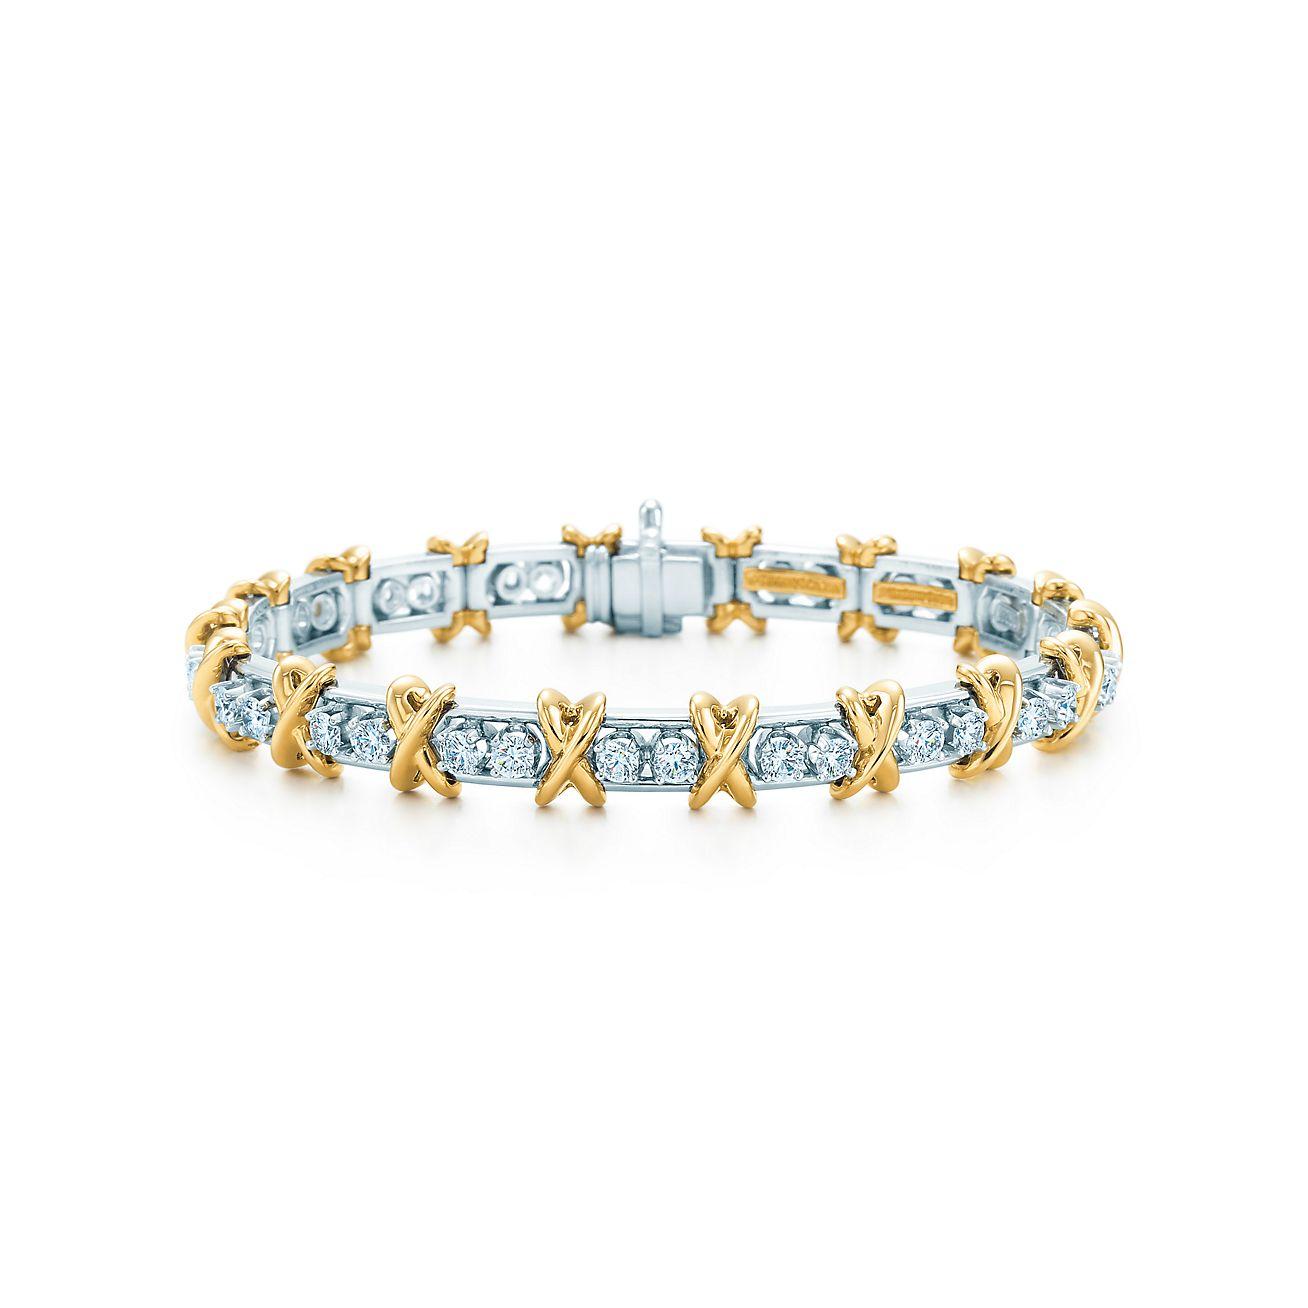 36 Stone Bracelet in 18k gold and platinum with round brilliant diamonds.